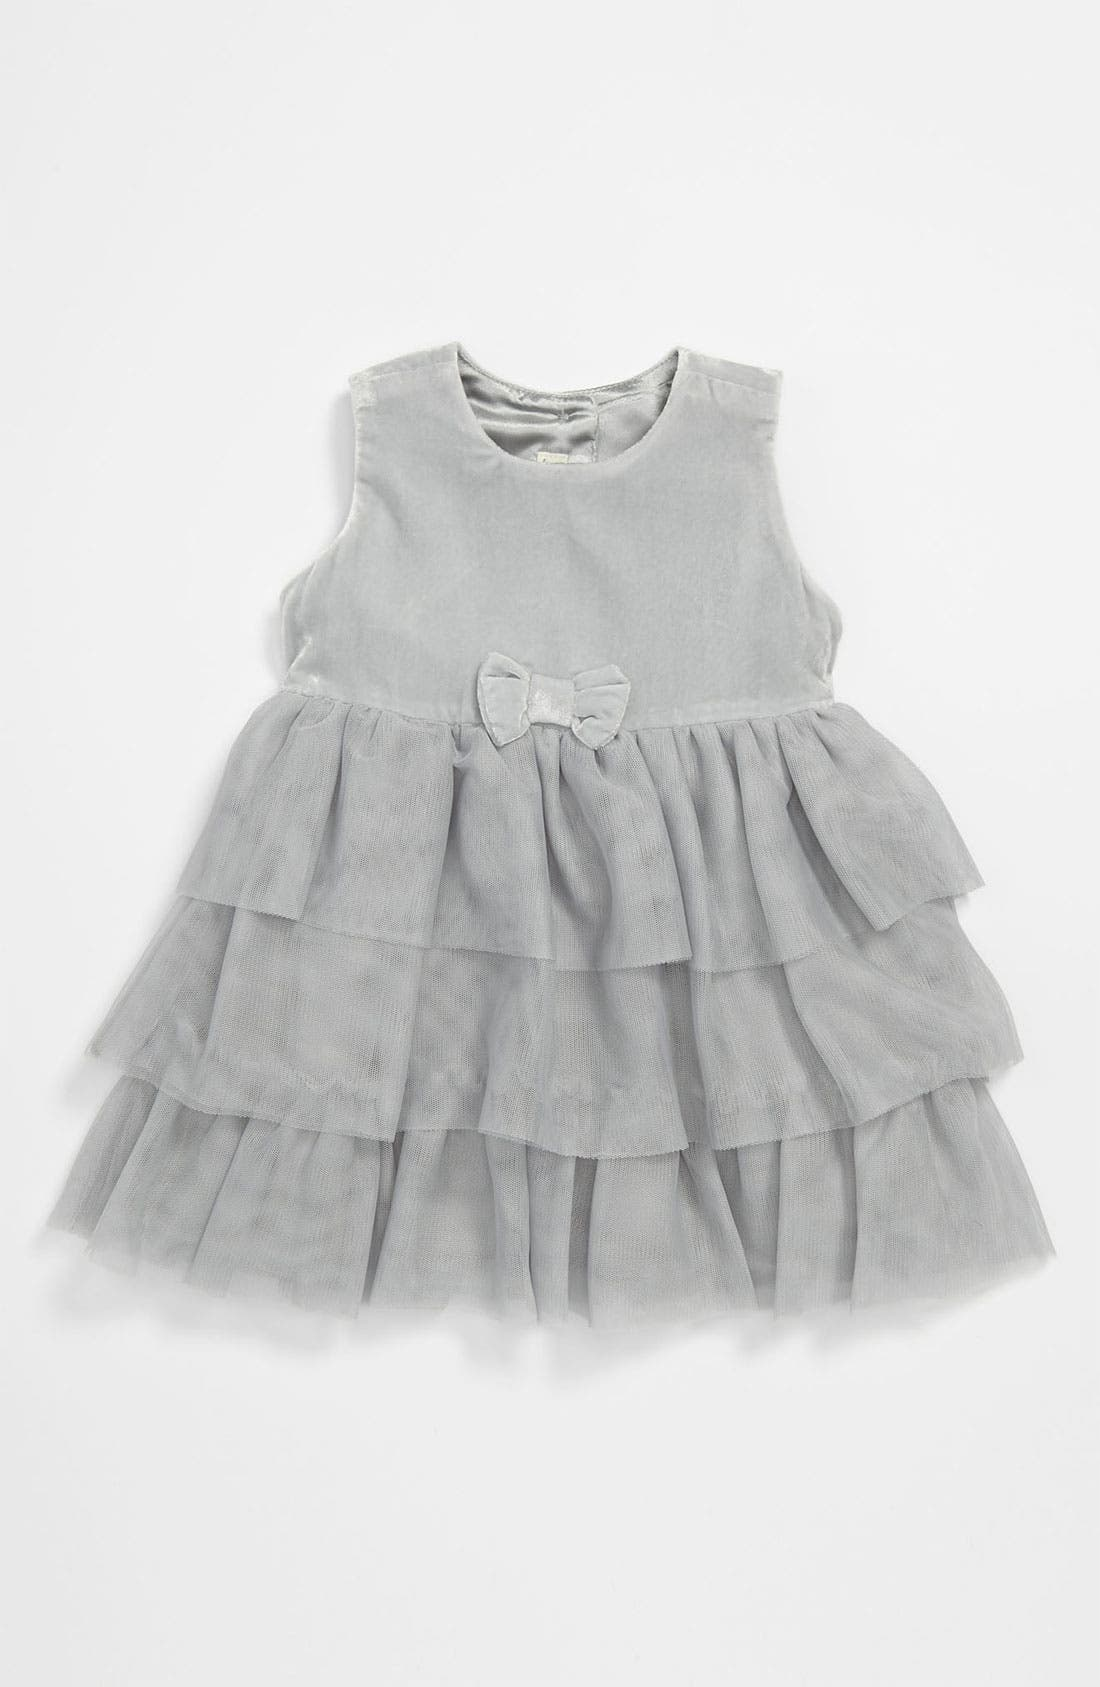 Alternate Image 1 Selected - United Colors of Benetton Kids Ruffle Dress (Infant)